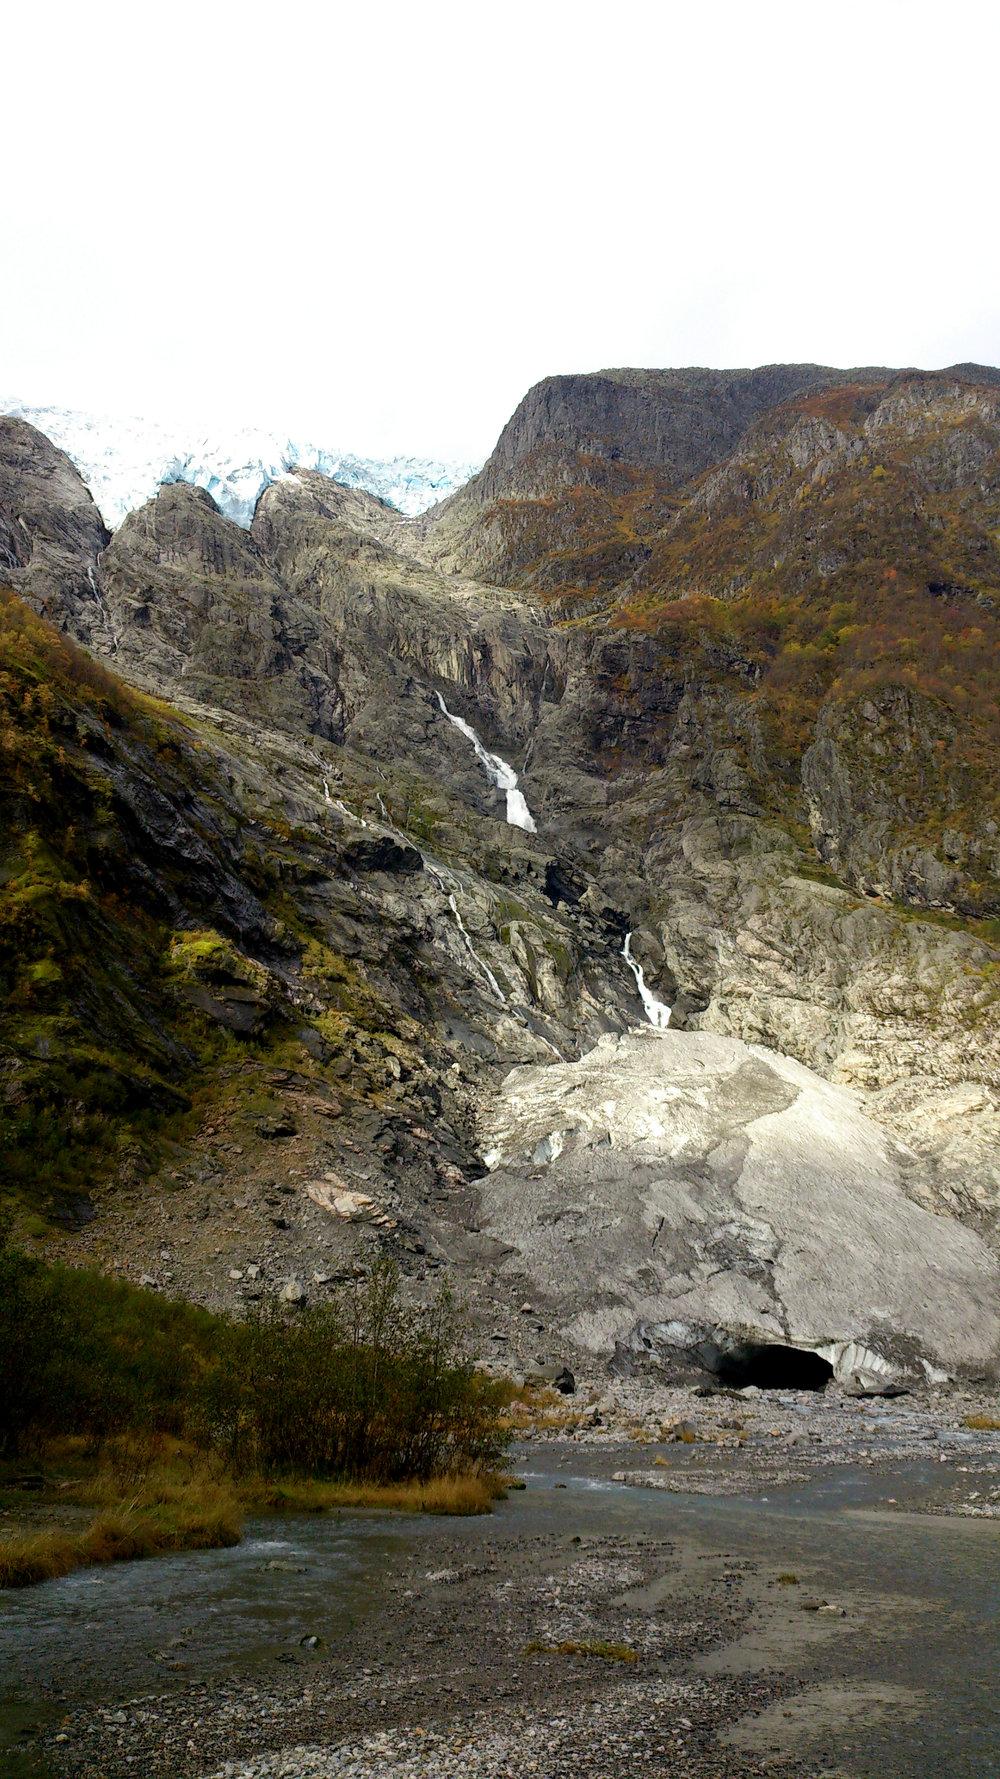 Supphellebreen Glacier 2014